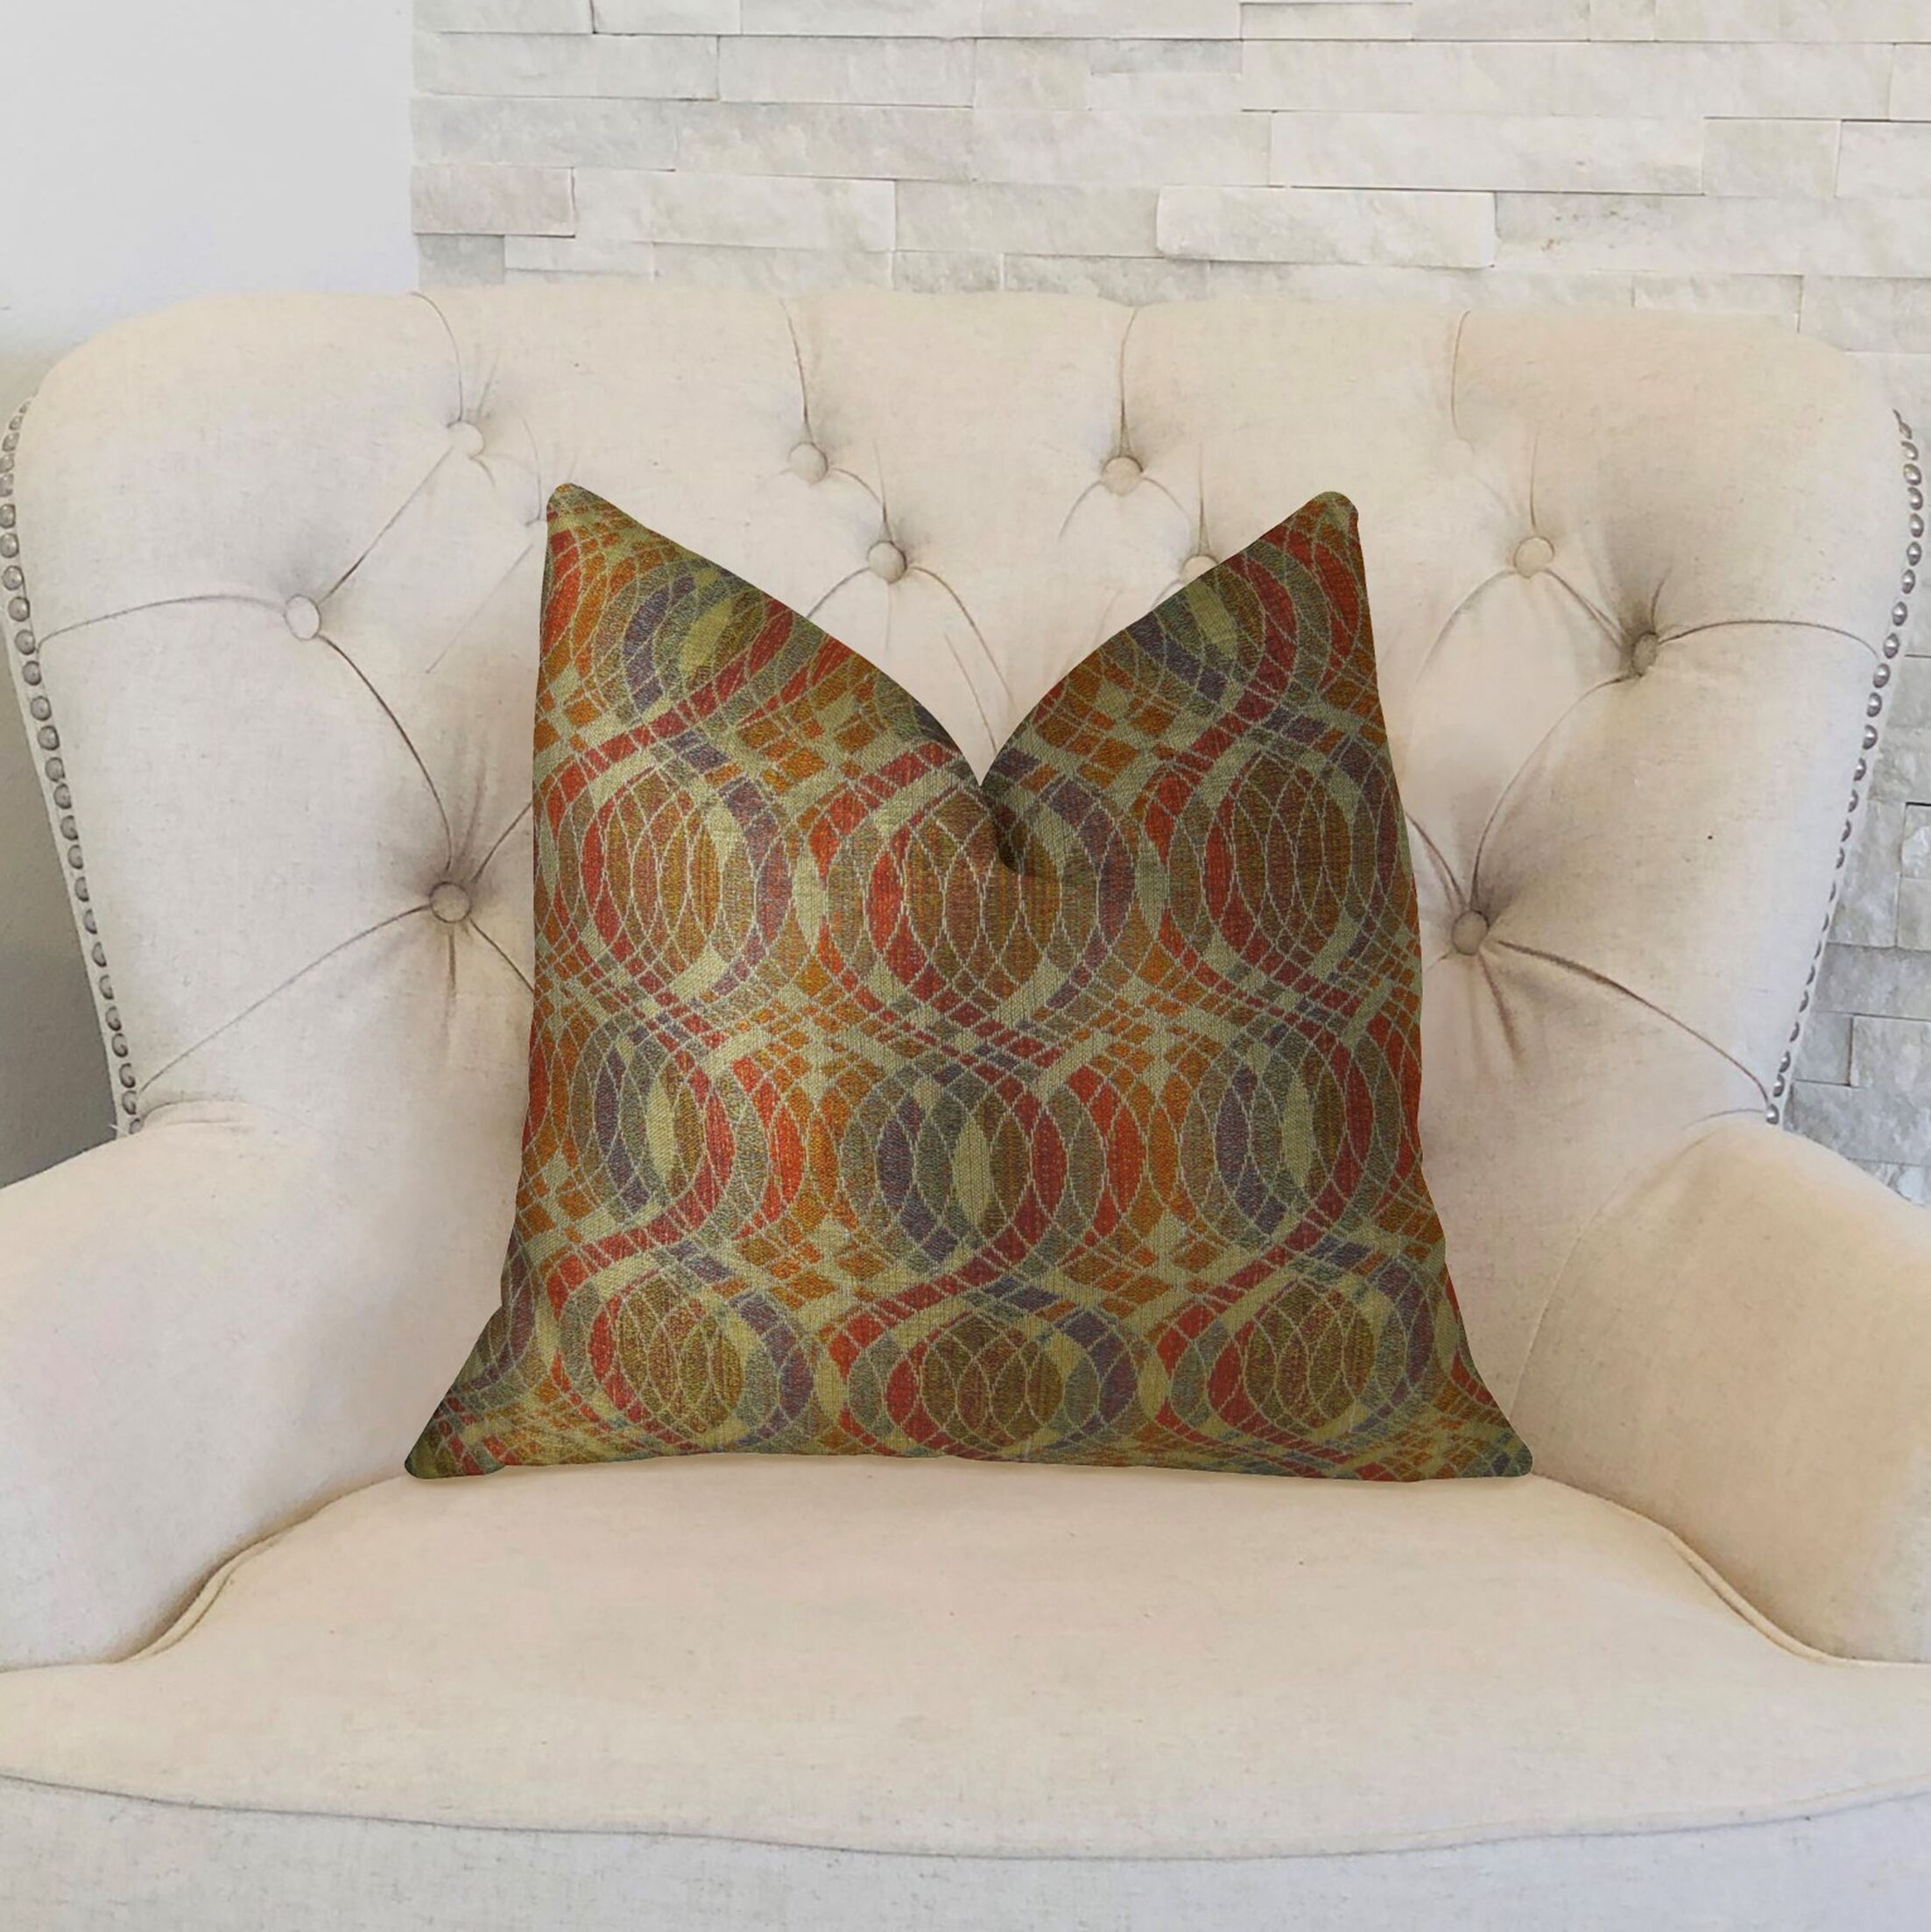 Orbitz Handmade Throw Pillow Size: 20